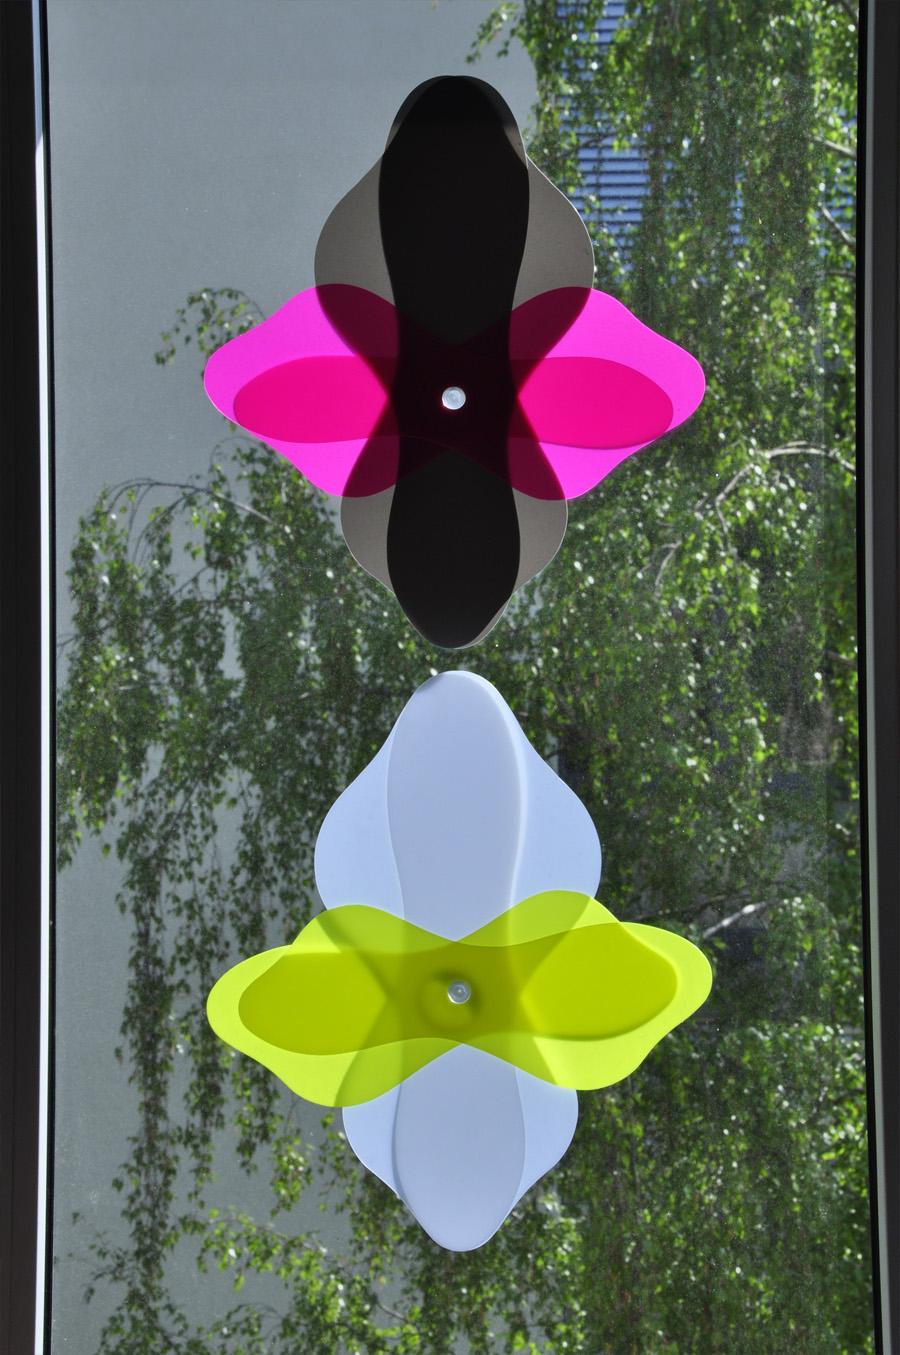 Freydenberg_Trans_Flower_Butterfly_37.jpg